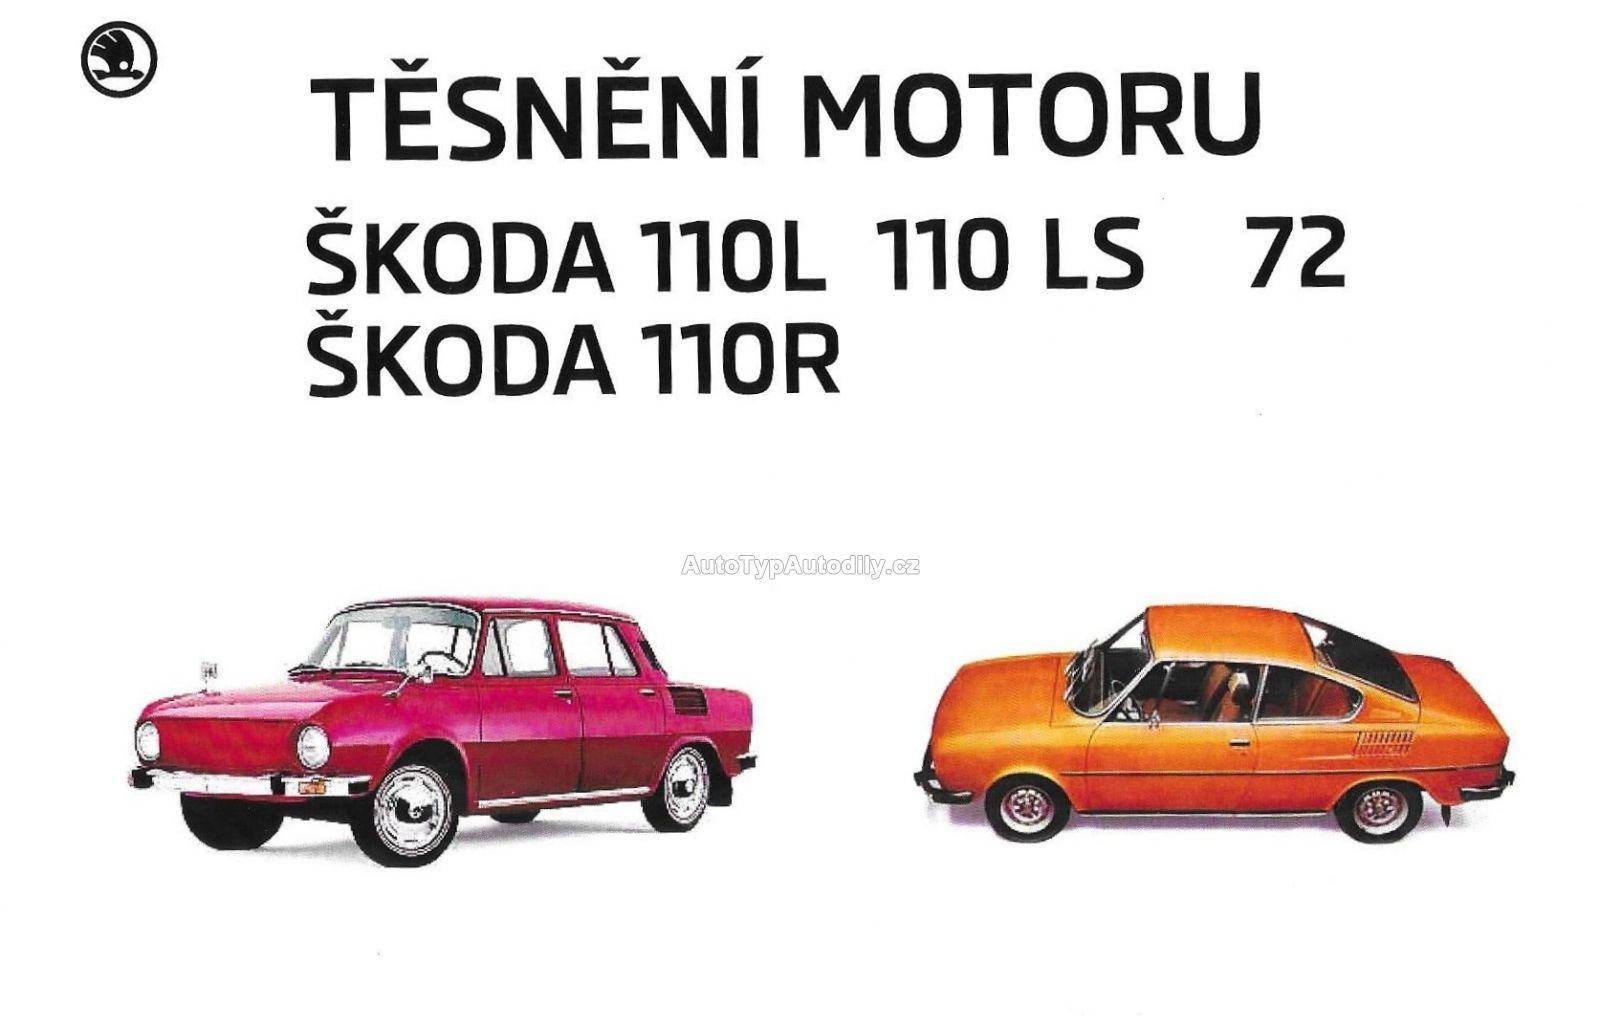 Sada těsnění na motor Škoda 110R/110LS Česko